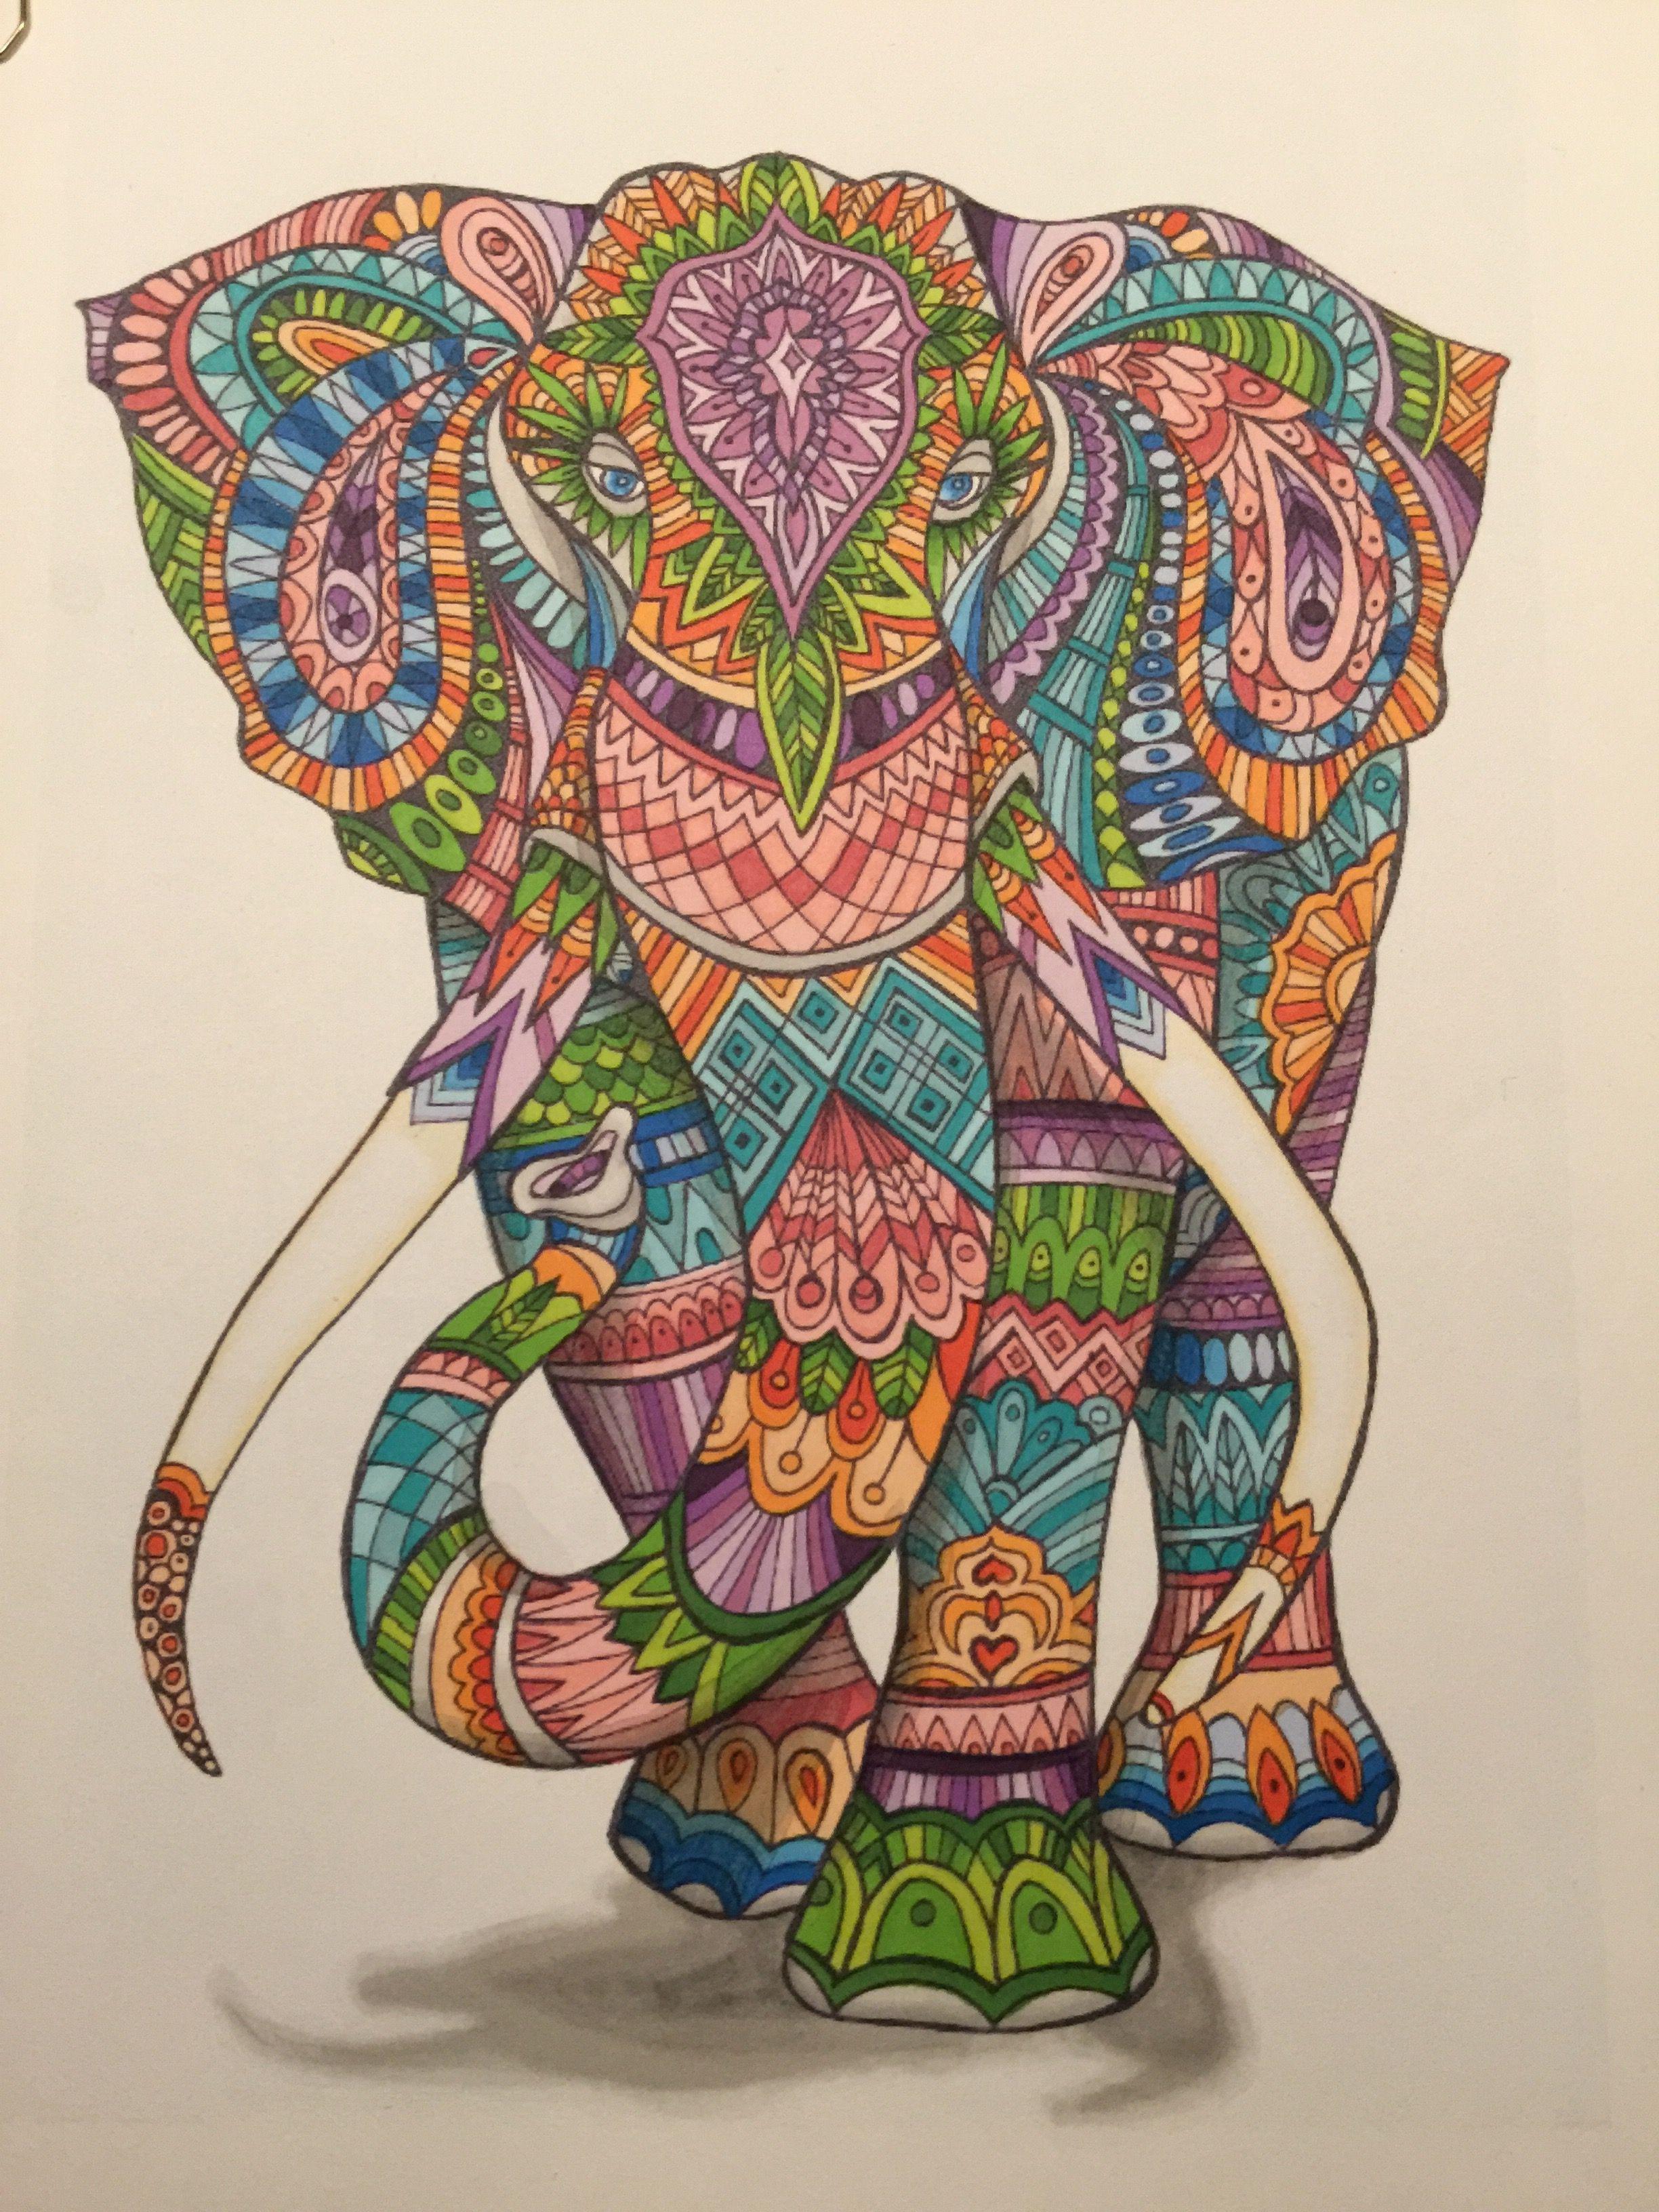 Elefant pysselpappa on instagram | Tuschteckningar | Pinterest ...